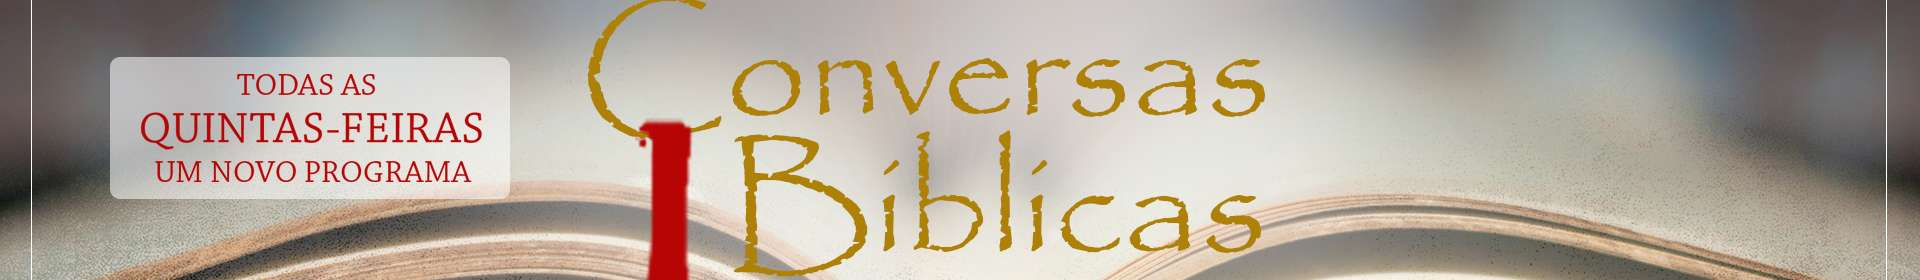 Conversas Bíblicas: Jerusalém - Parte 3